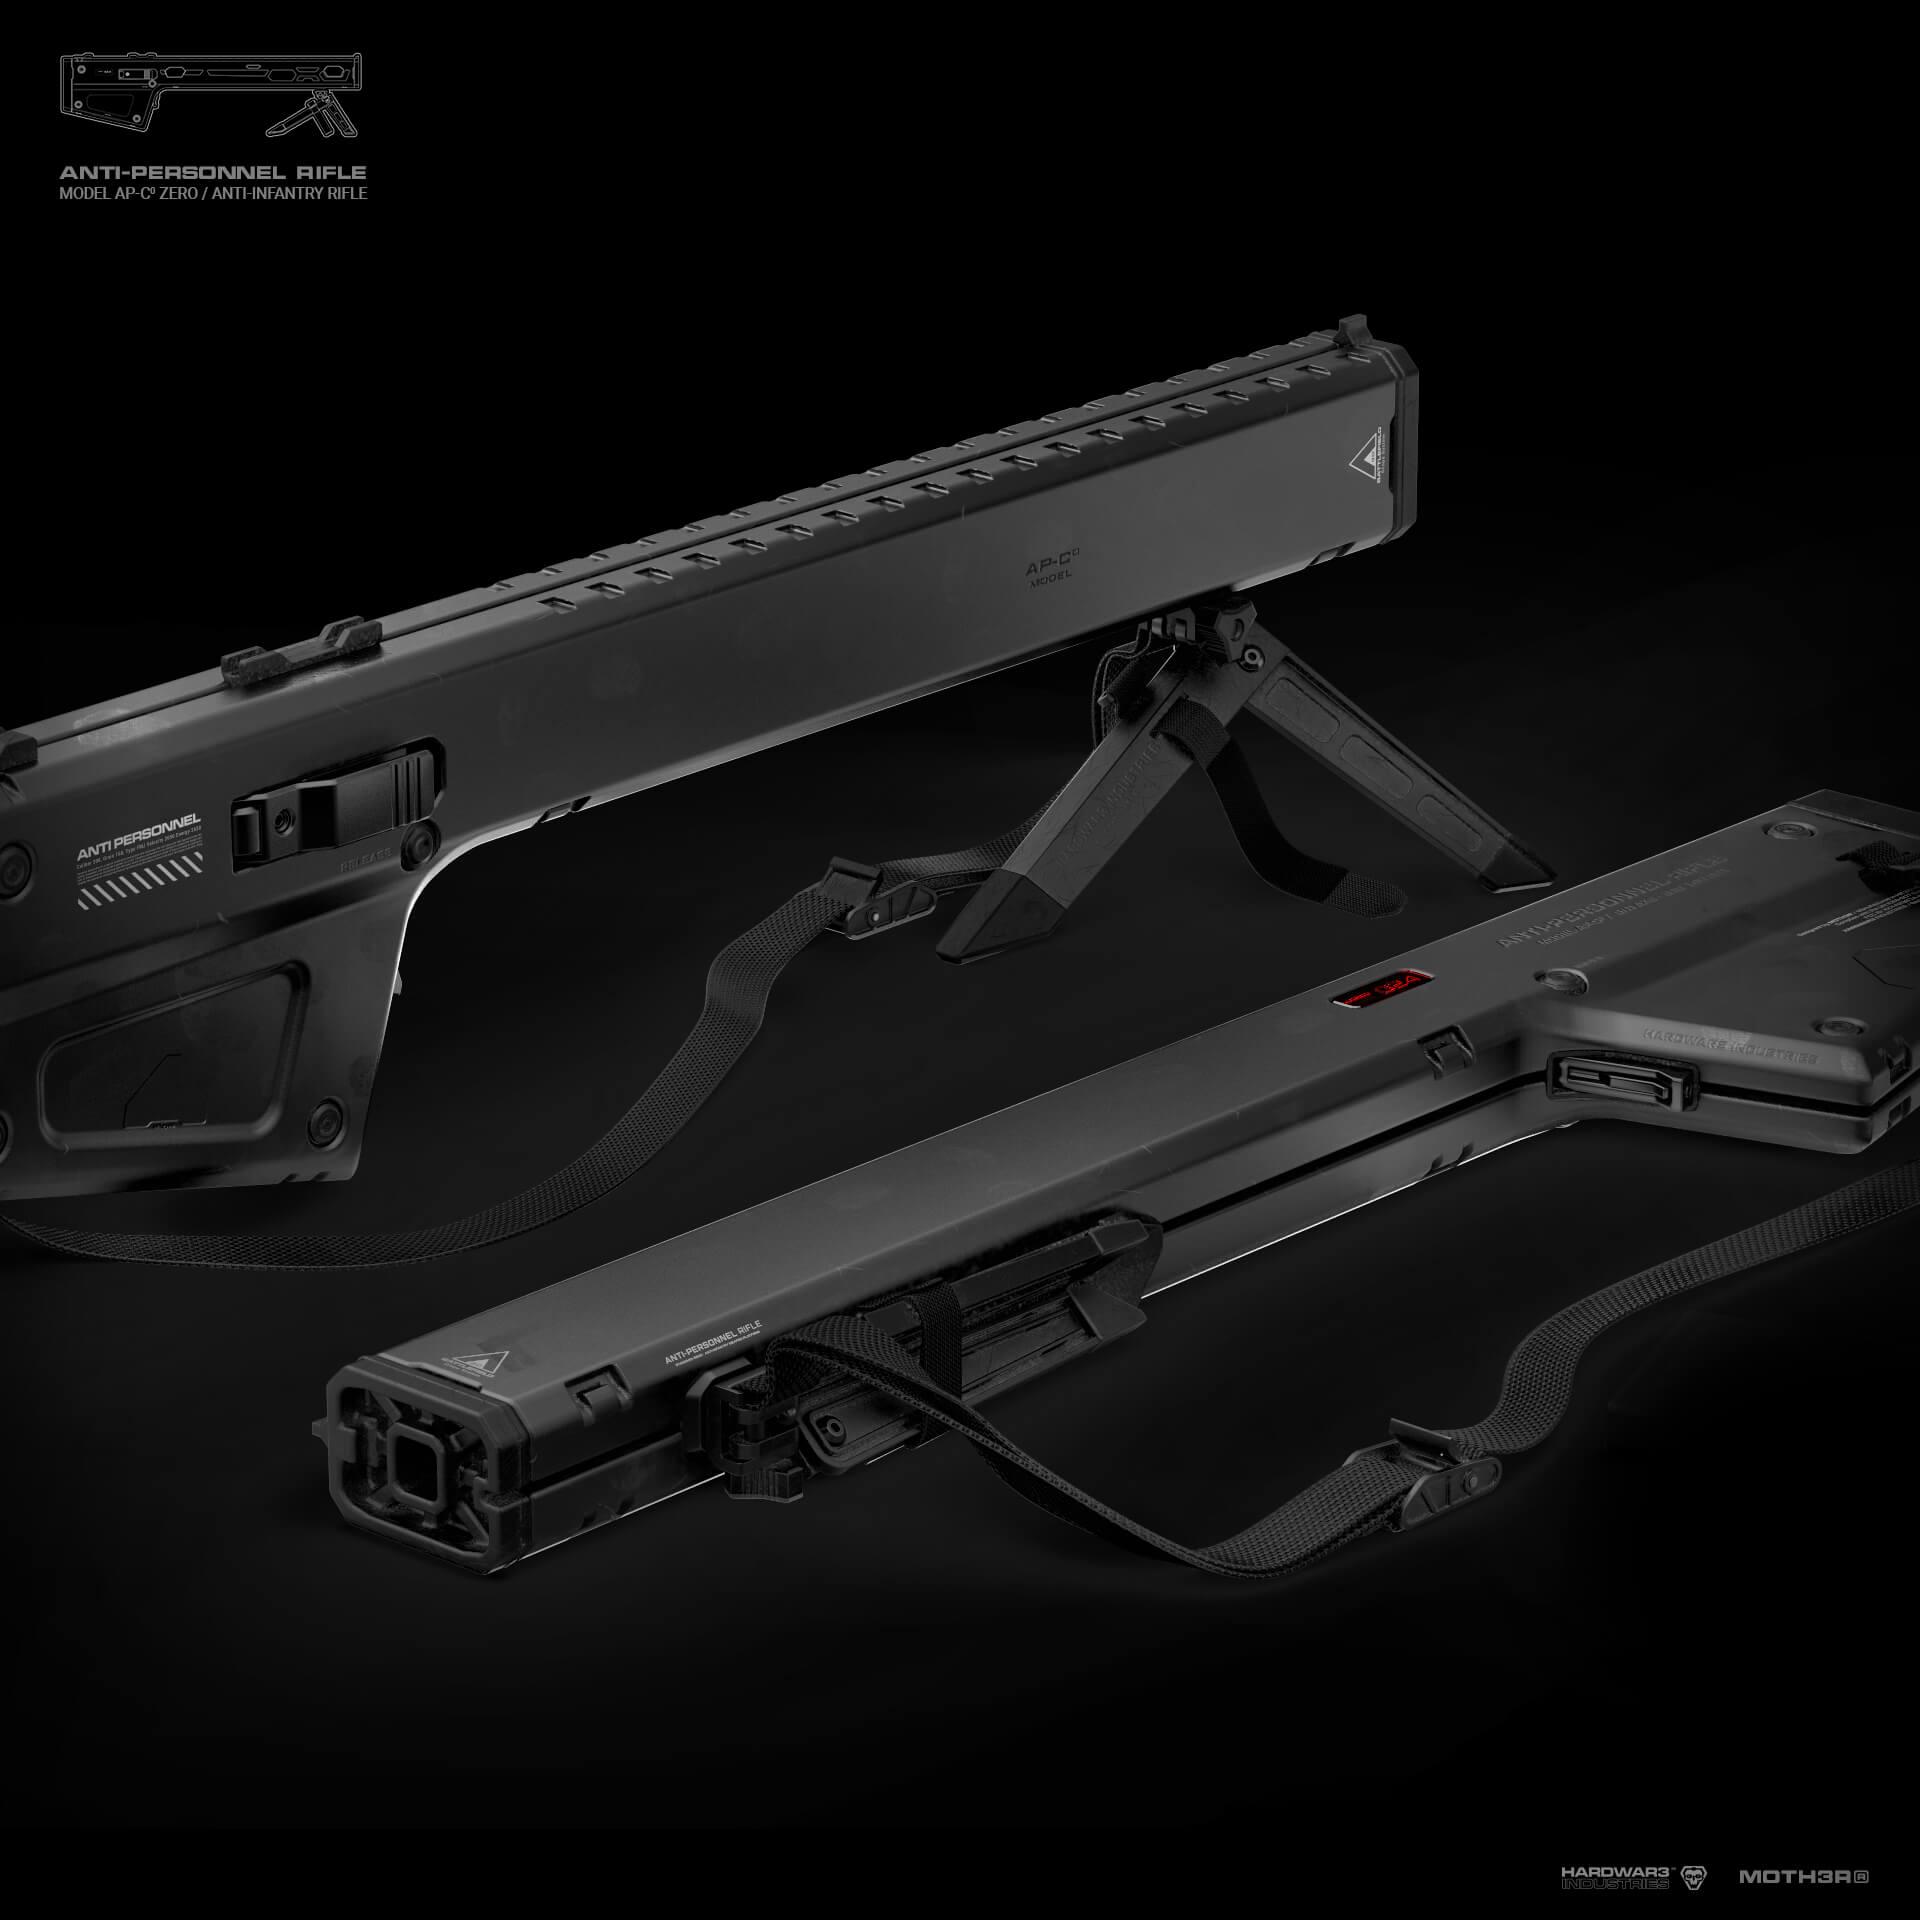 AP-C³ Rifle